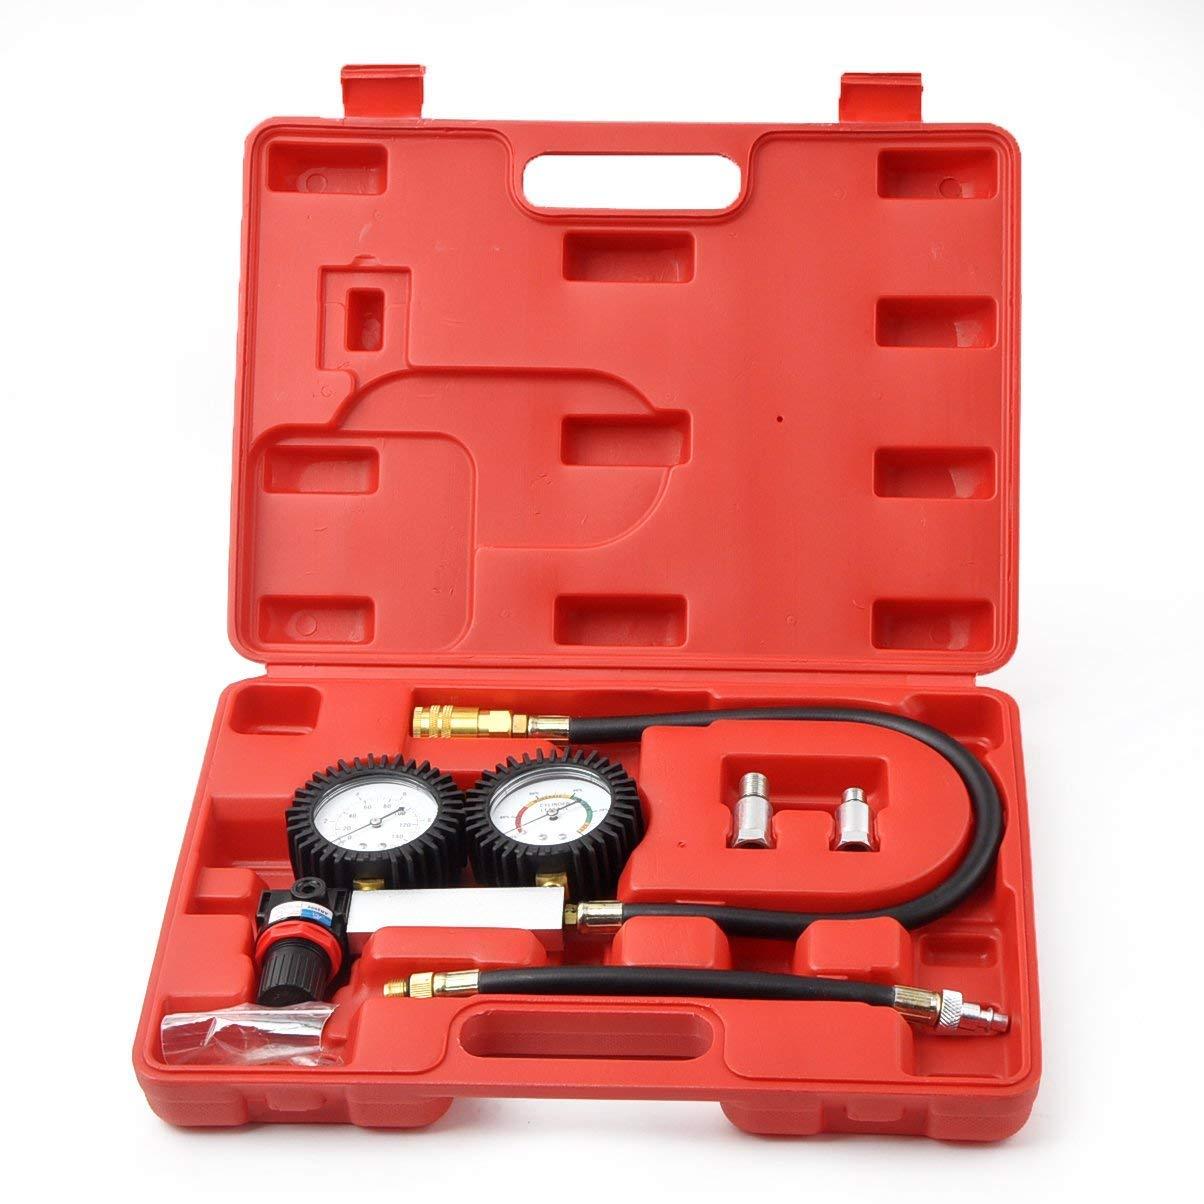 Yoico Cylinder Leakage Tester Kit Automotive Tool Gauge, Detector Engine Leak Down Leakage Tester Kit